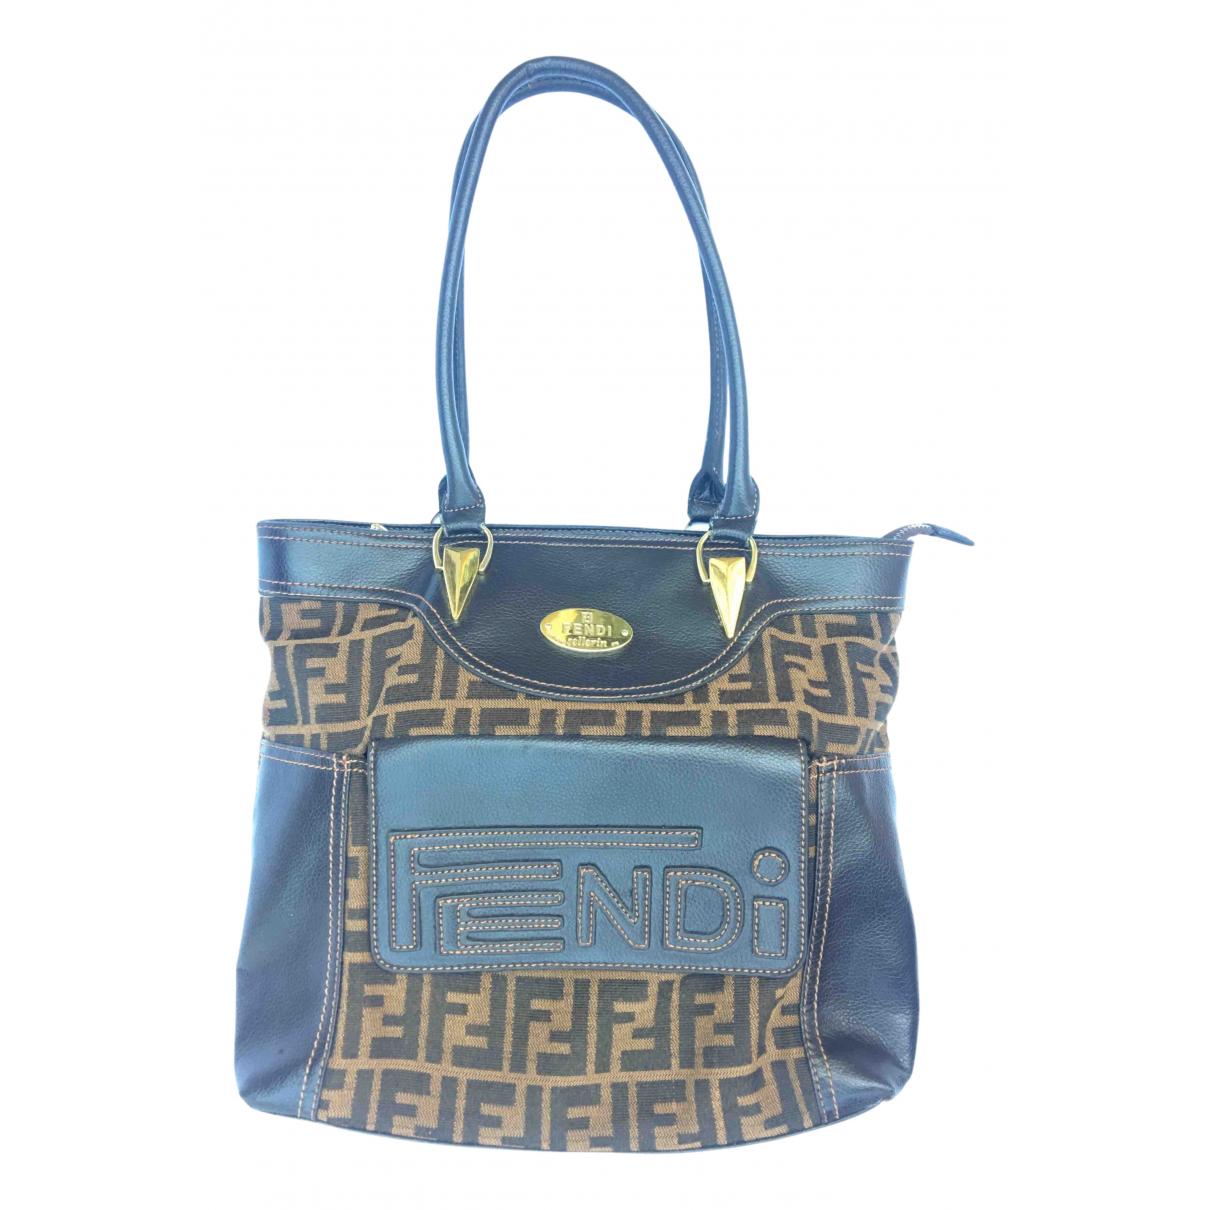 Fendi N Multicolour Cloth handbag for Women N